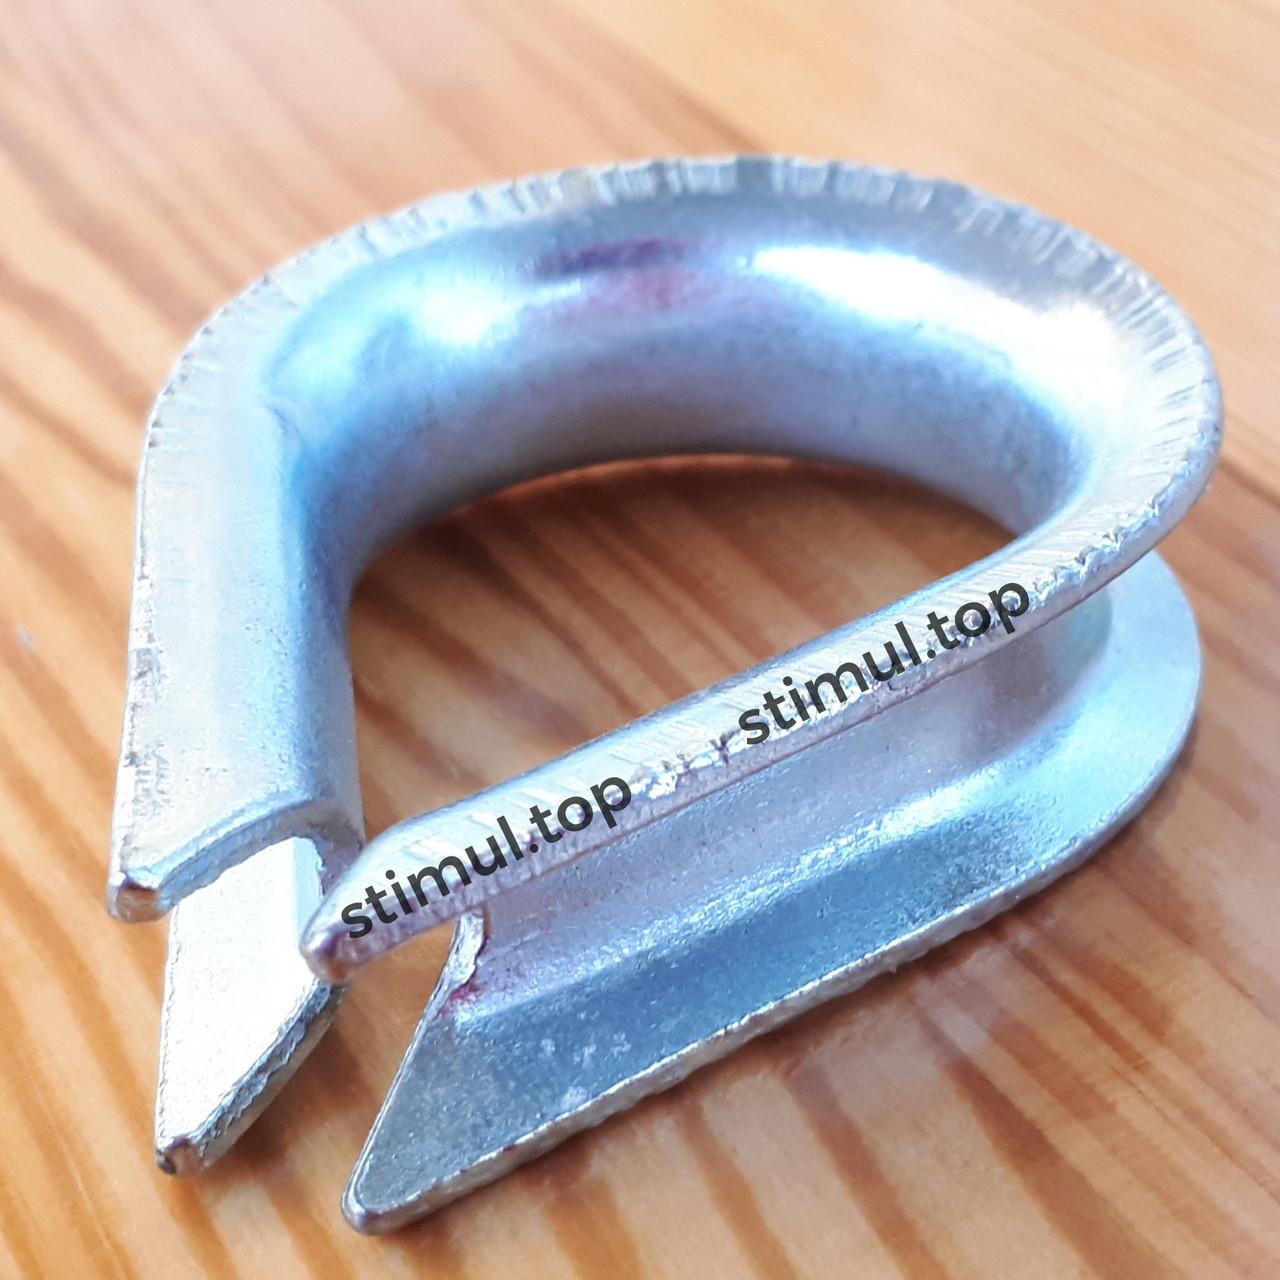 Коуш для троса Ø 16 мм | DIN 6899 | Коуш для стальных канатов оцинкованный | Коуши оцинковані для канатів